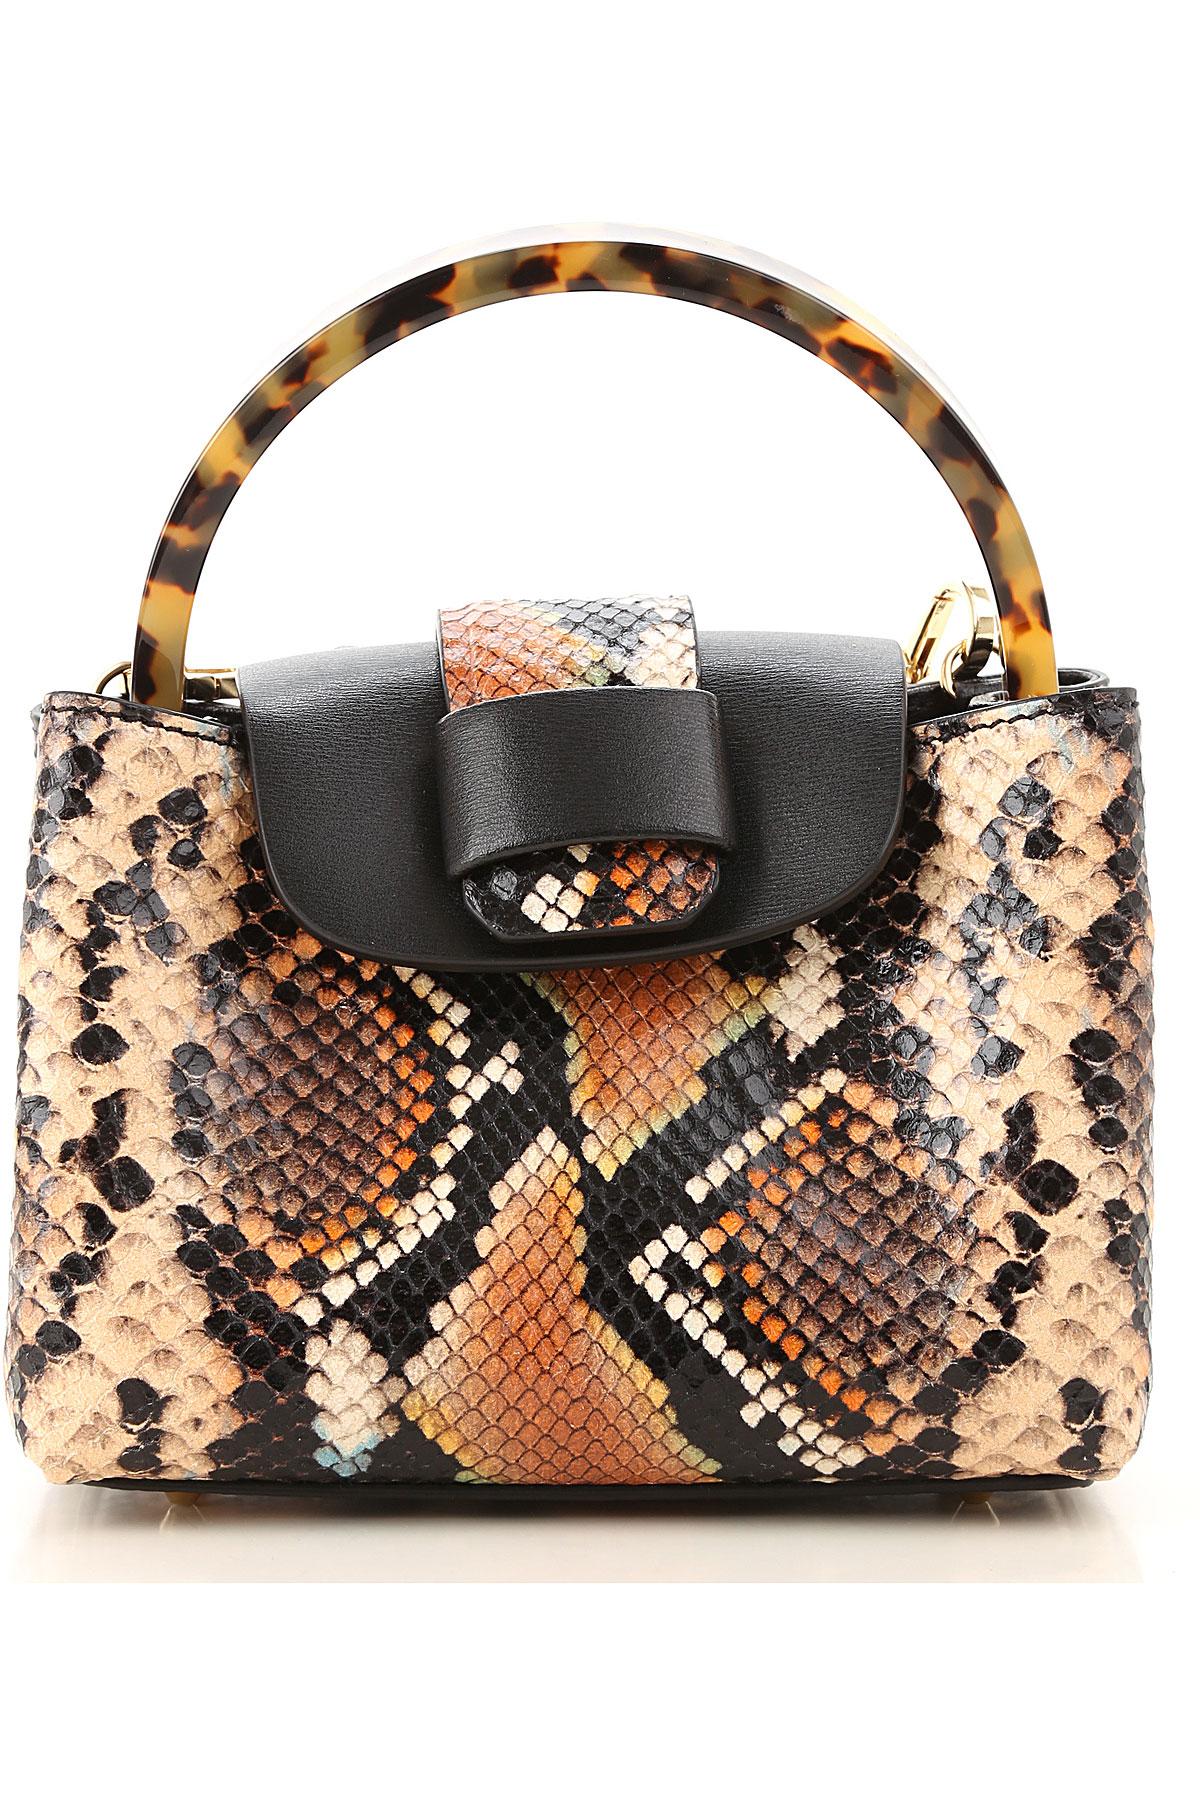 Nico Giani Top Handle Handbag On Sale, Multicolor, Leather, 2019